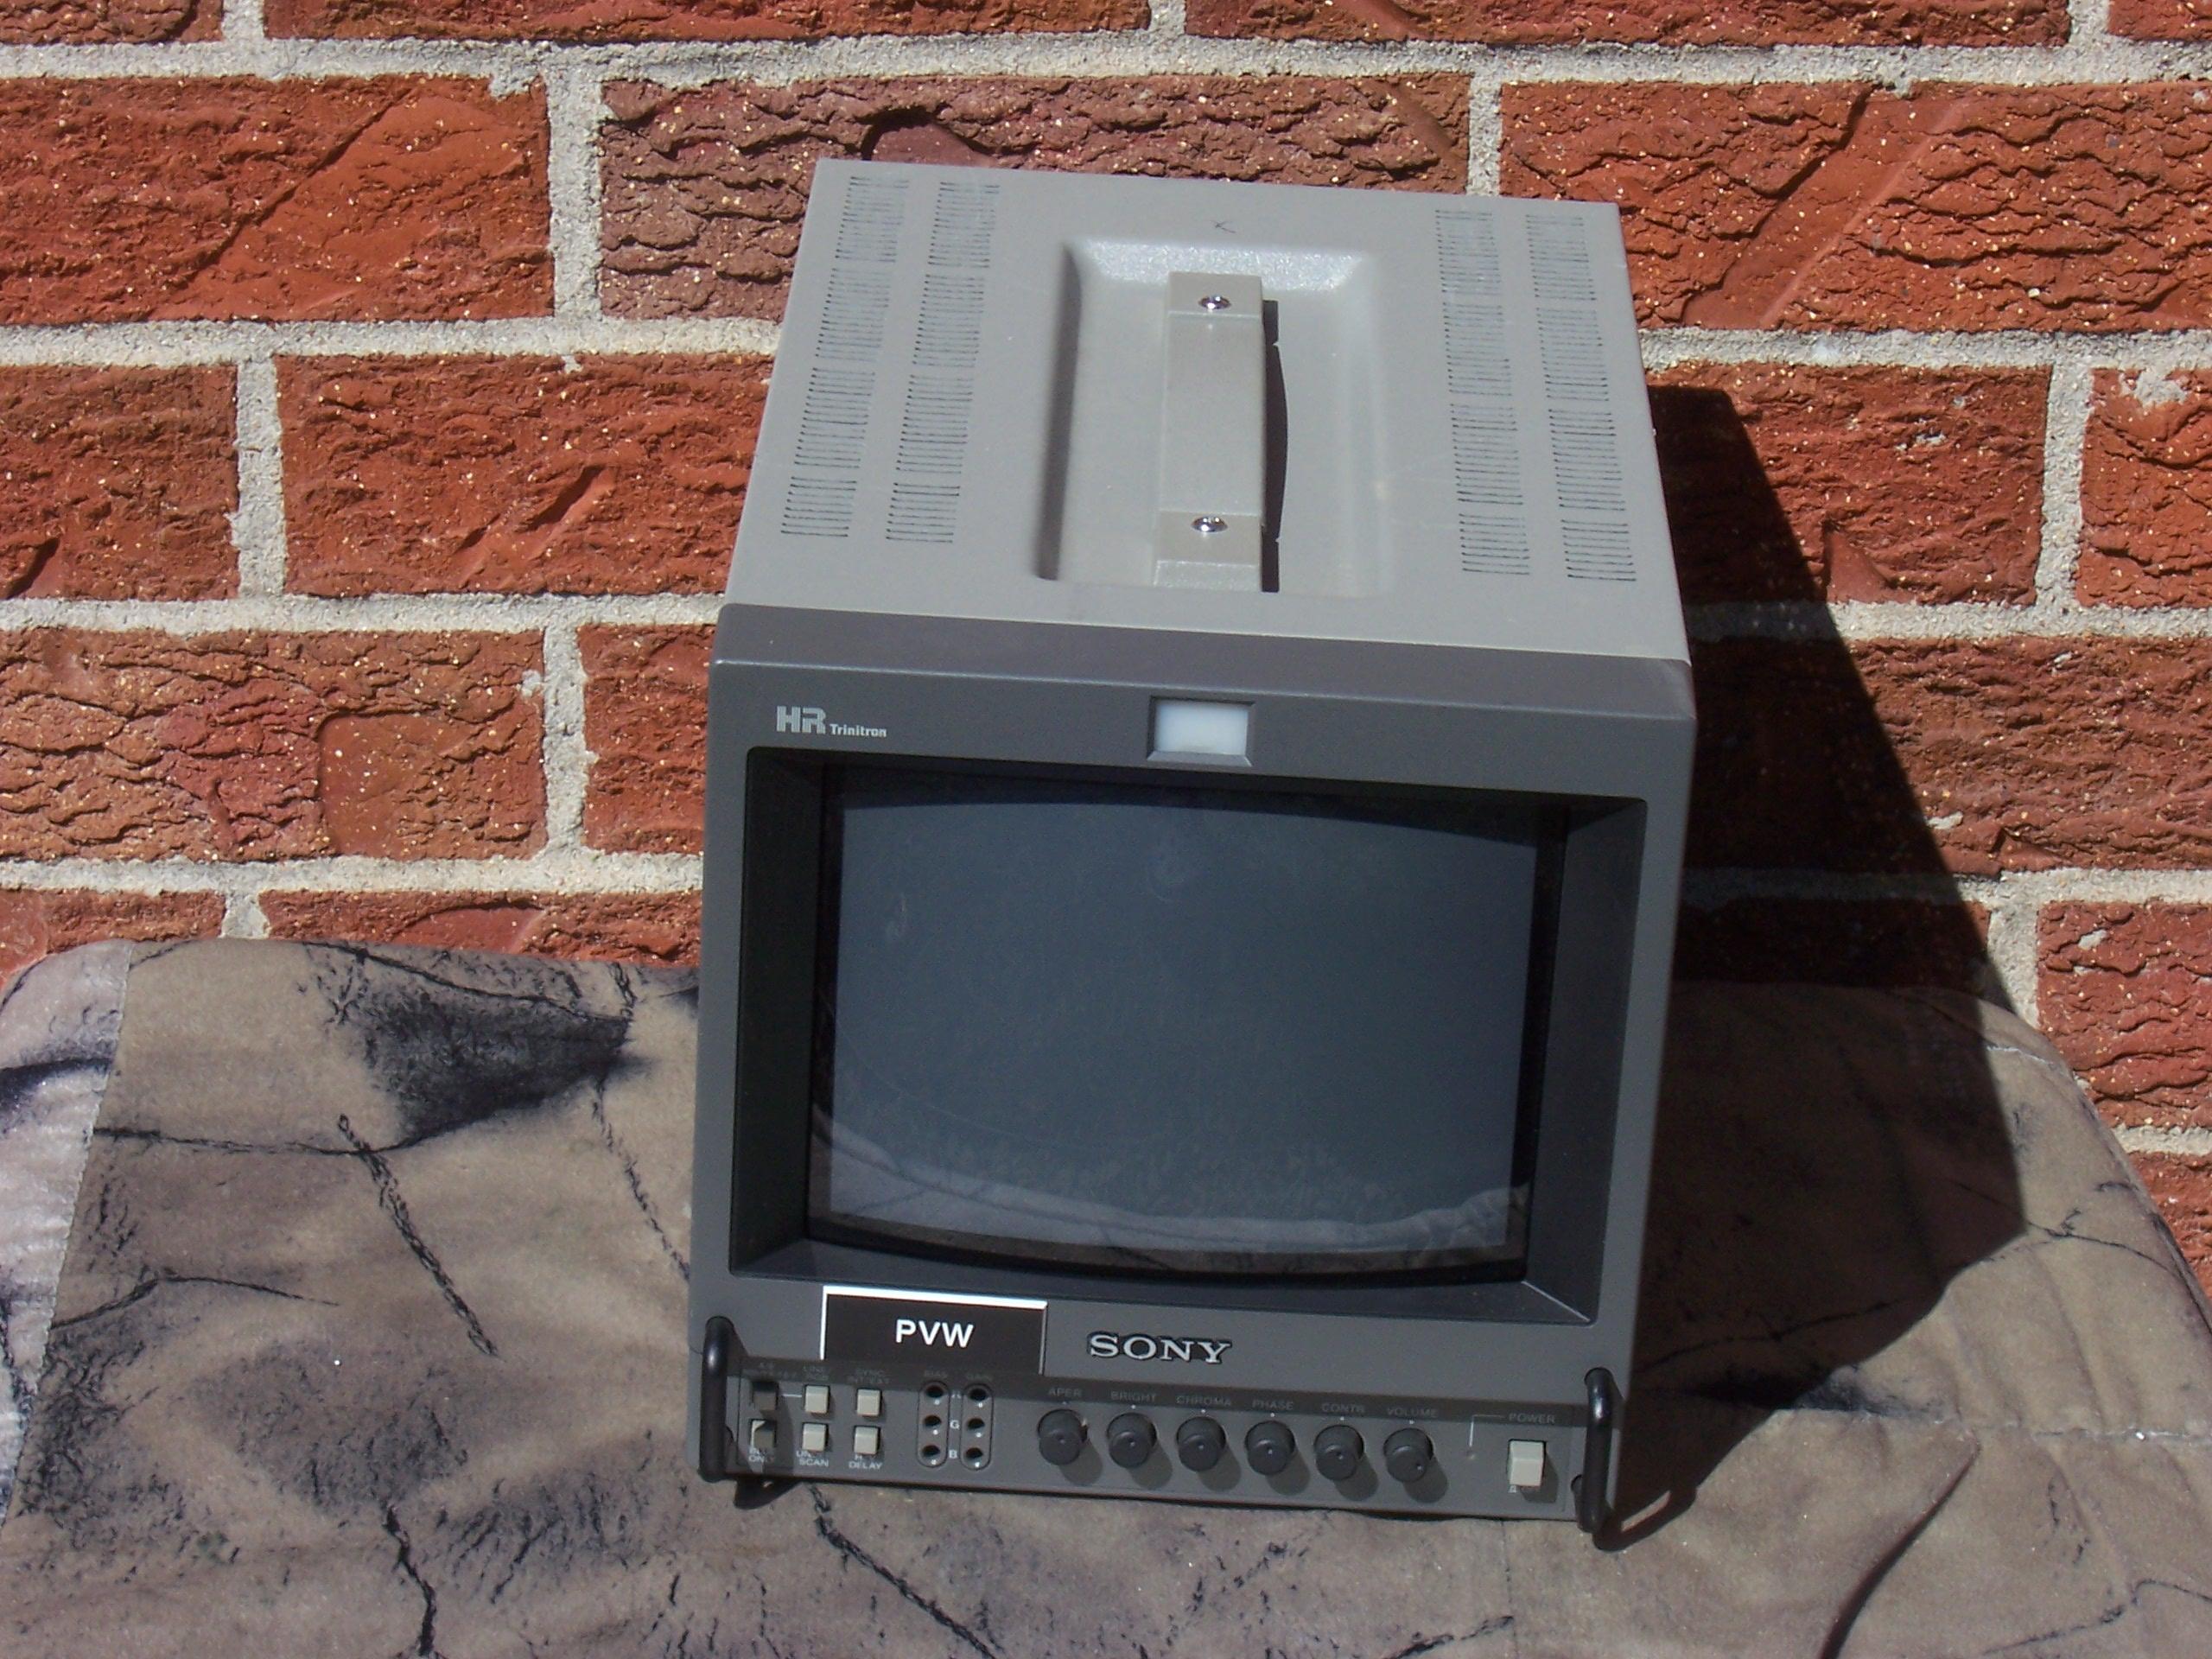 Sony Pvm 8044q Color 8 Monitor Imagine41